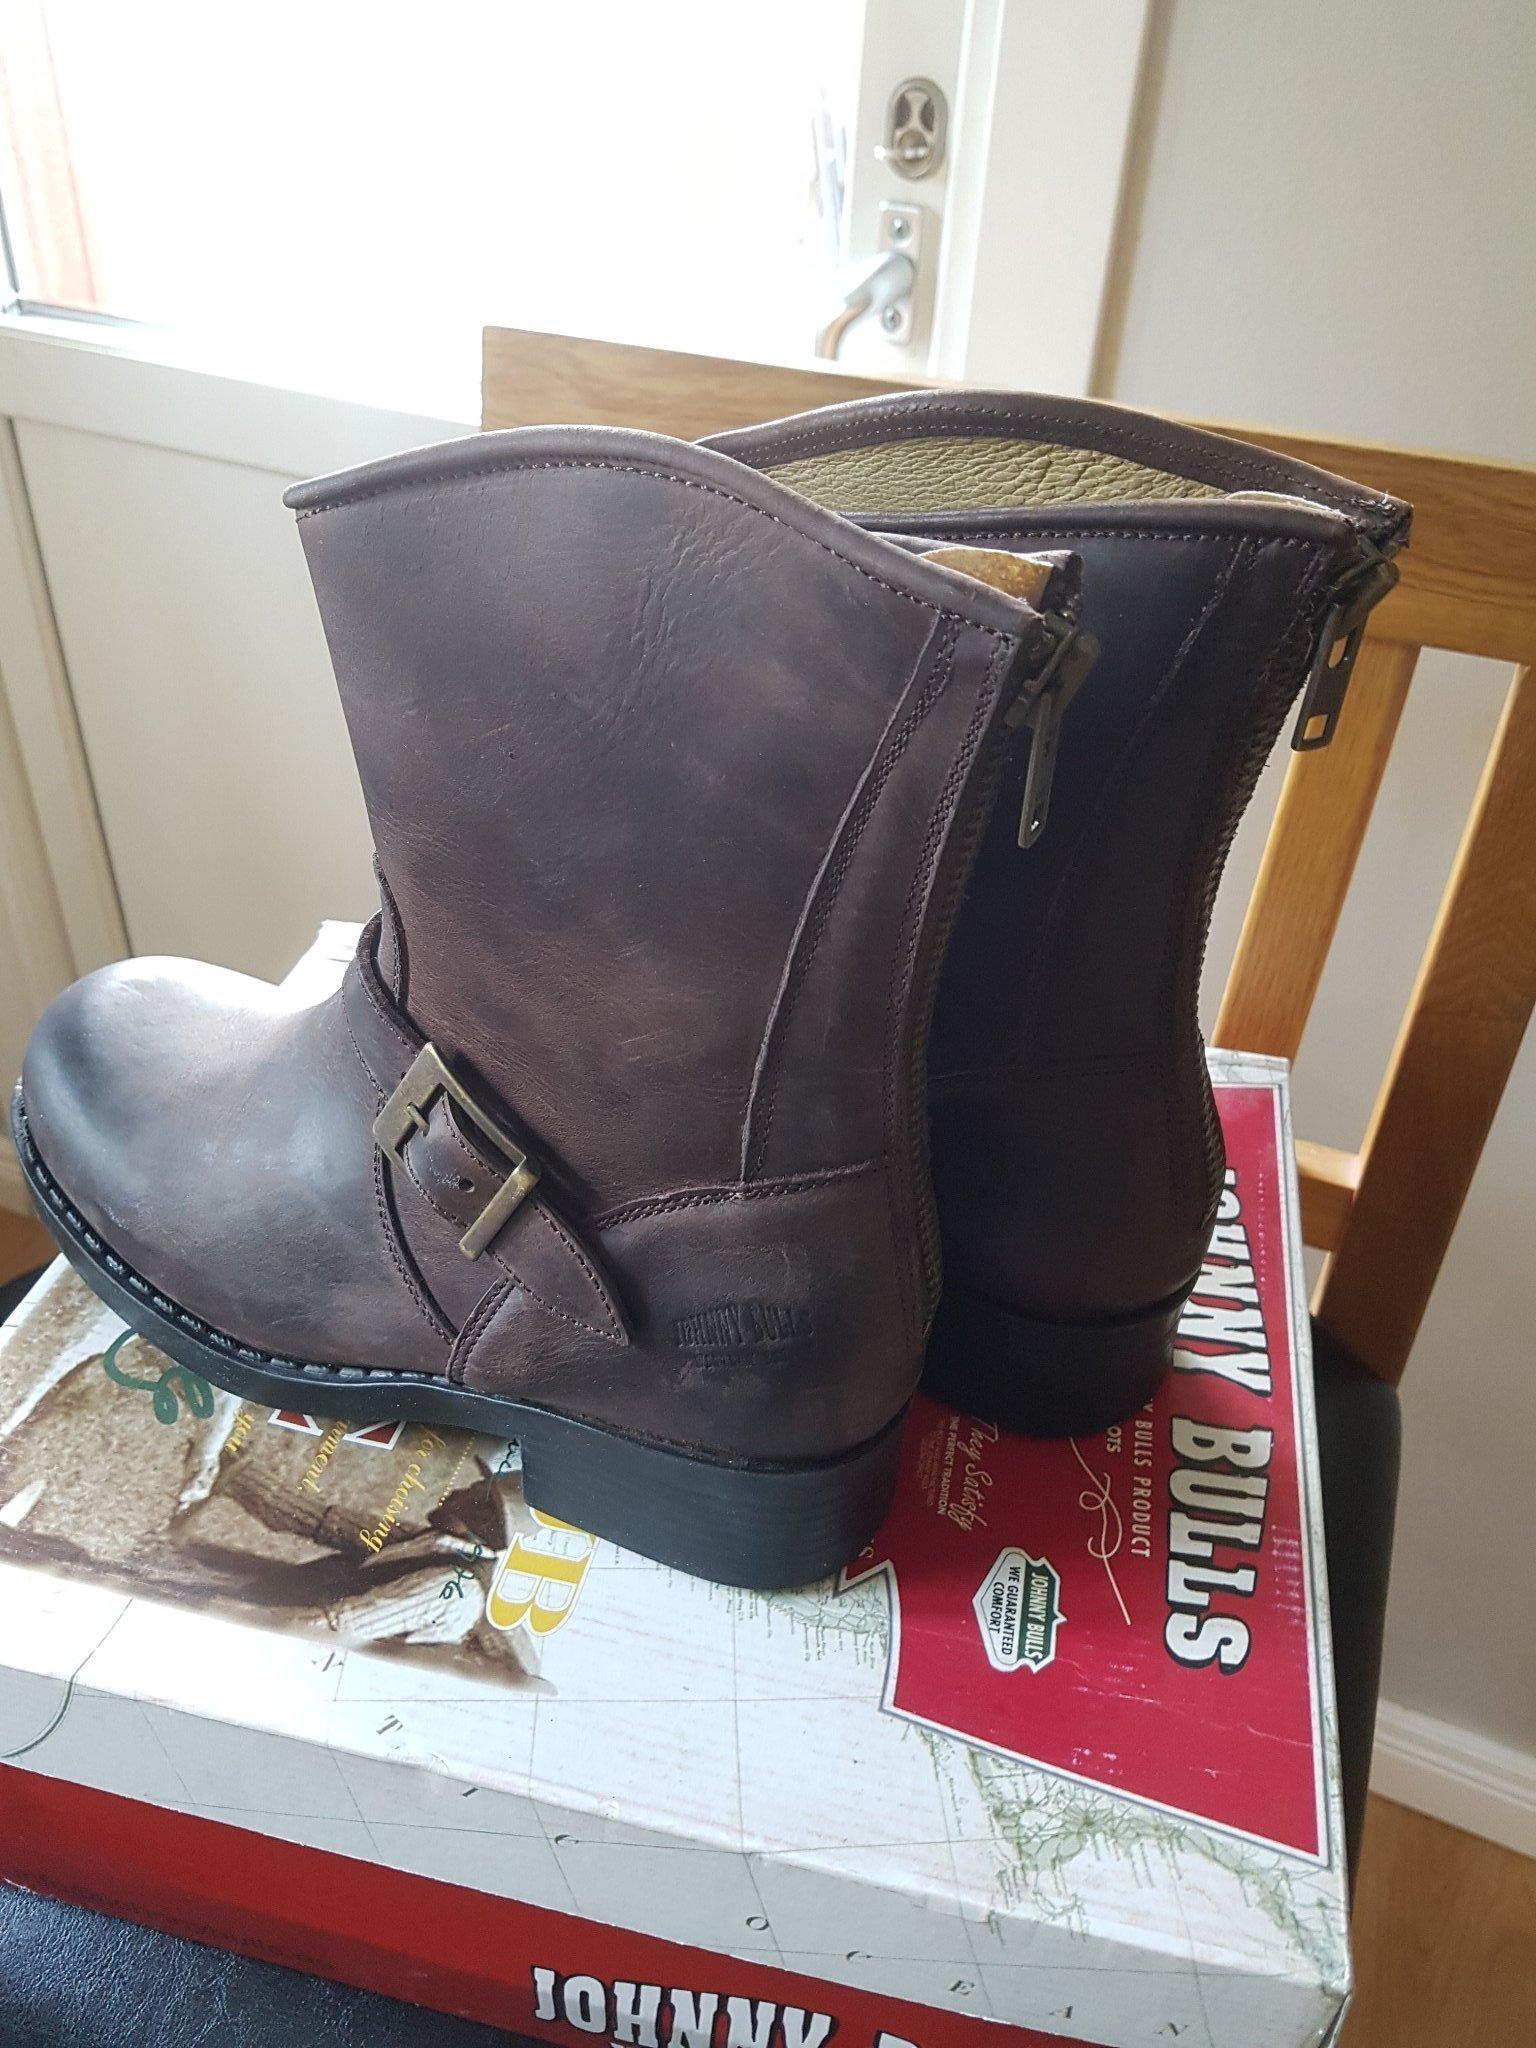 HELT NYA!! Tuffa bruna boots i äkta skinn 40 Johnny Bulls i orginalkartong!